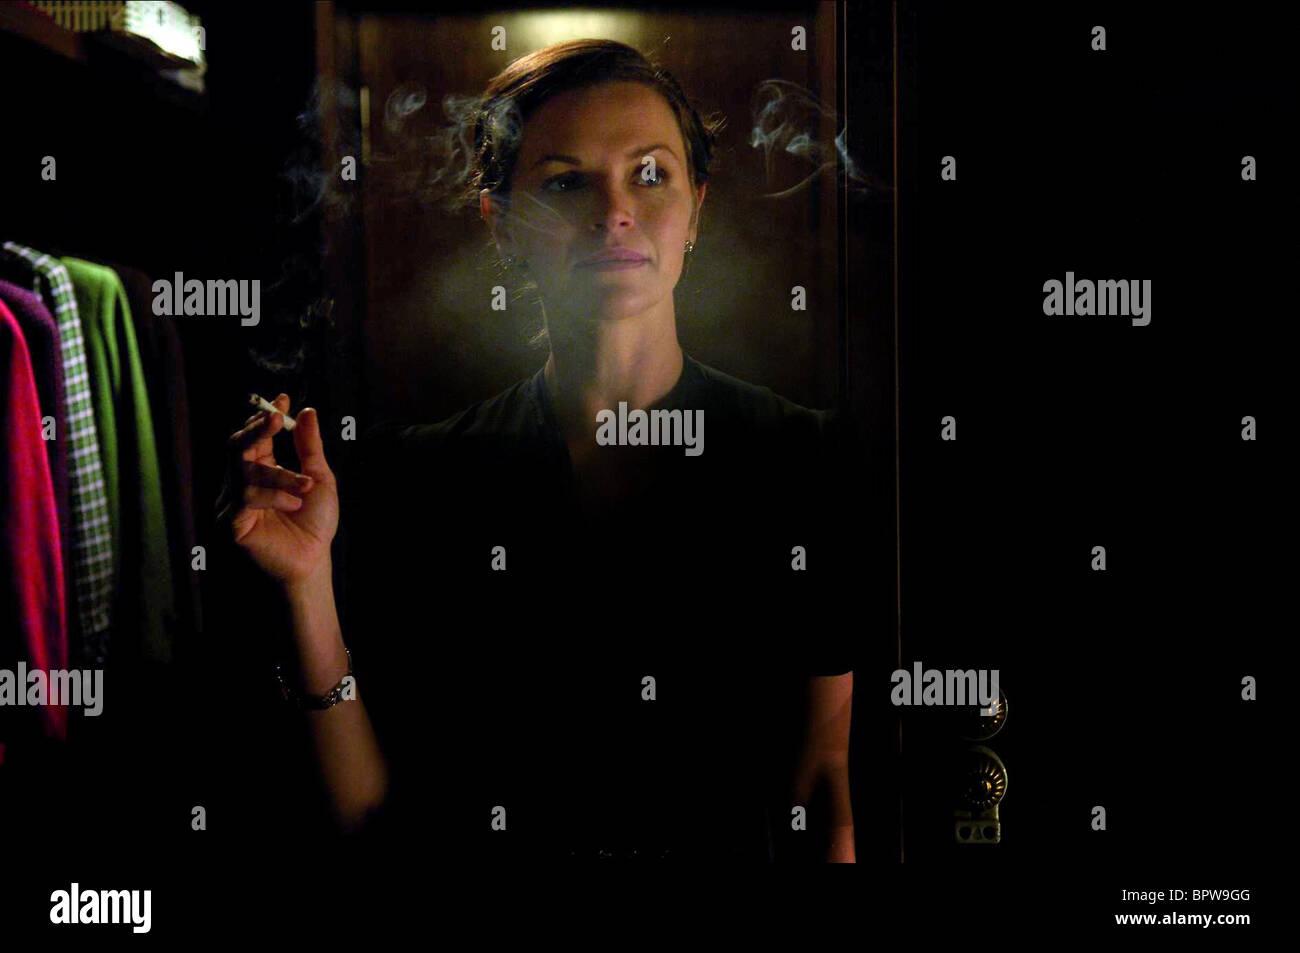 STINE STENGADE FLAME AND CITRON; FLAMMEN & CITRONEN (2008) - Stock Image